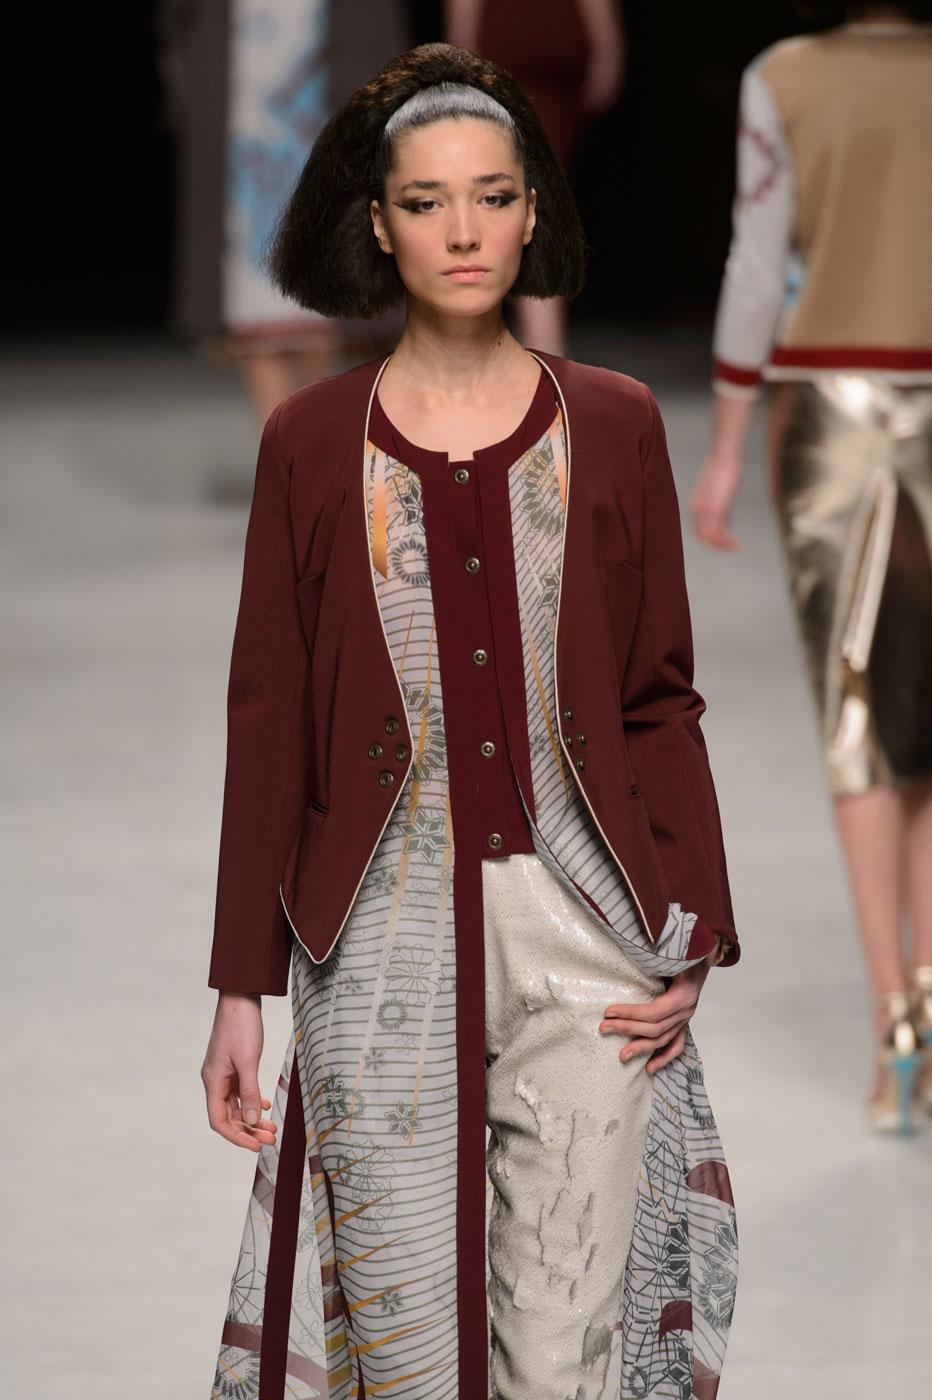 Julien-Fournie-Prive-fashion-runway-show-haute-couture-paris-spring-2015-the-impression-11